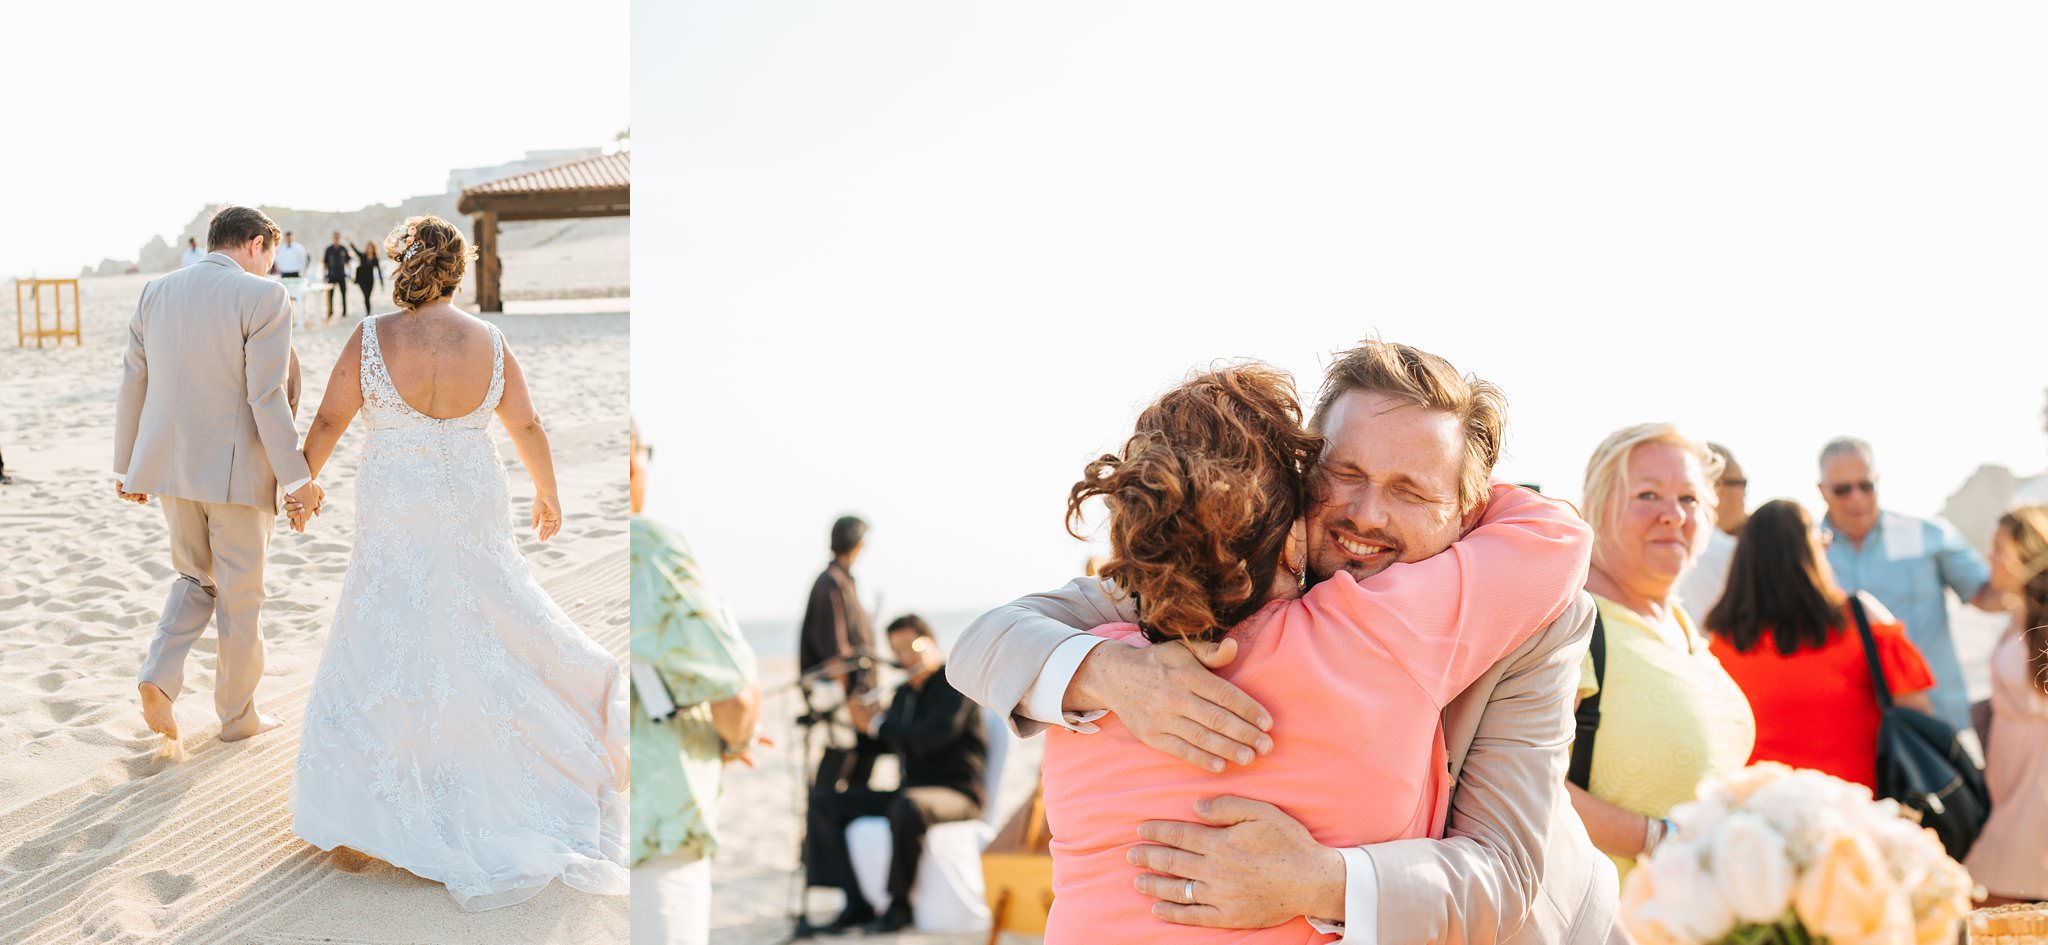 Cabo San Lucas Beach Wedding in Mexico - https://brittneyhannonphotography.com